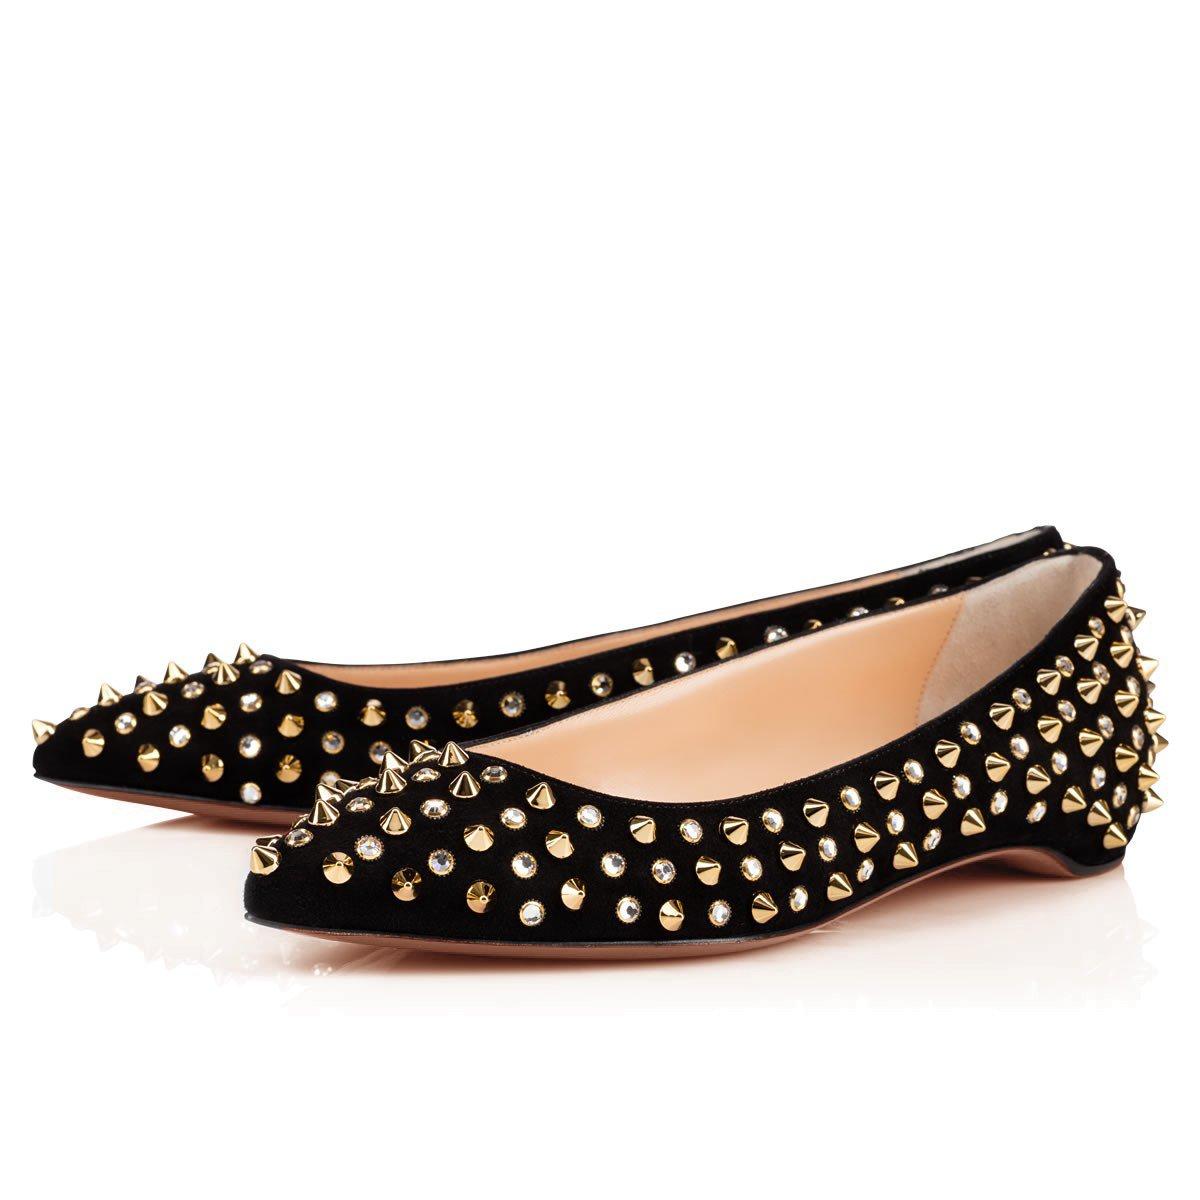 Mermaid B071XPQCXT Women's Shoes Pointed Toe Spiked Rivets Comfortable Flats B071XPQCXT Mermaid US13 Feet length 11.09